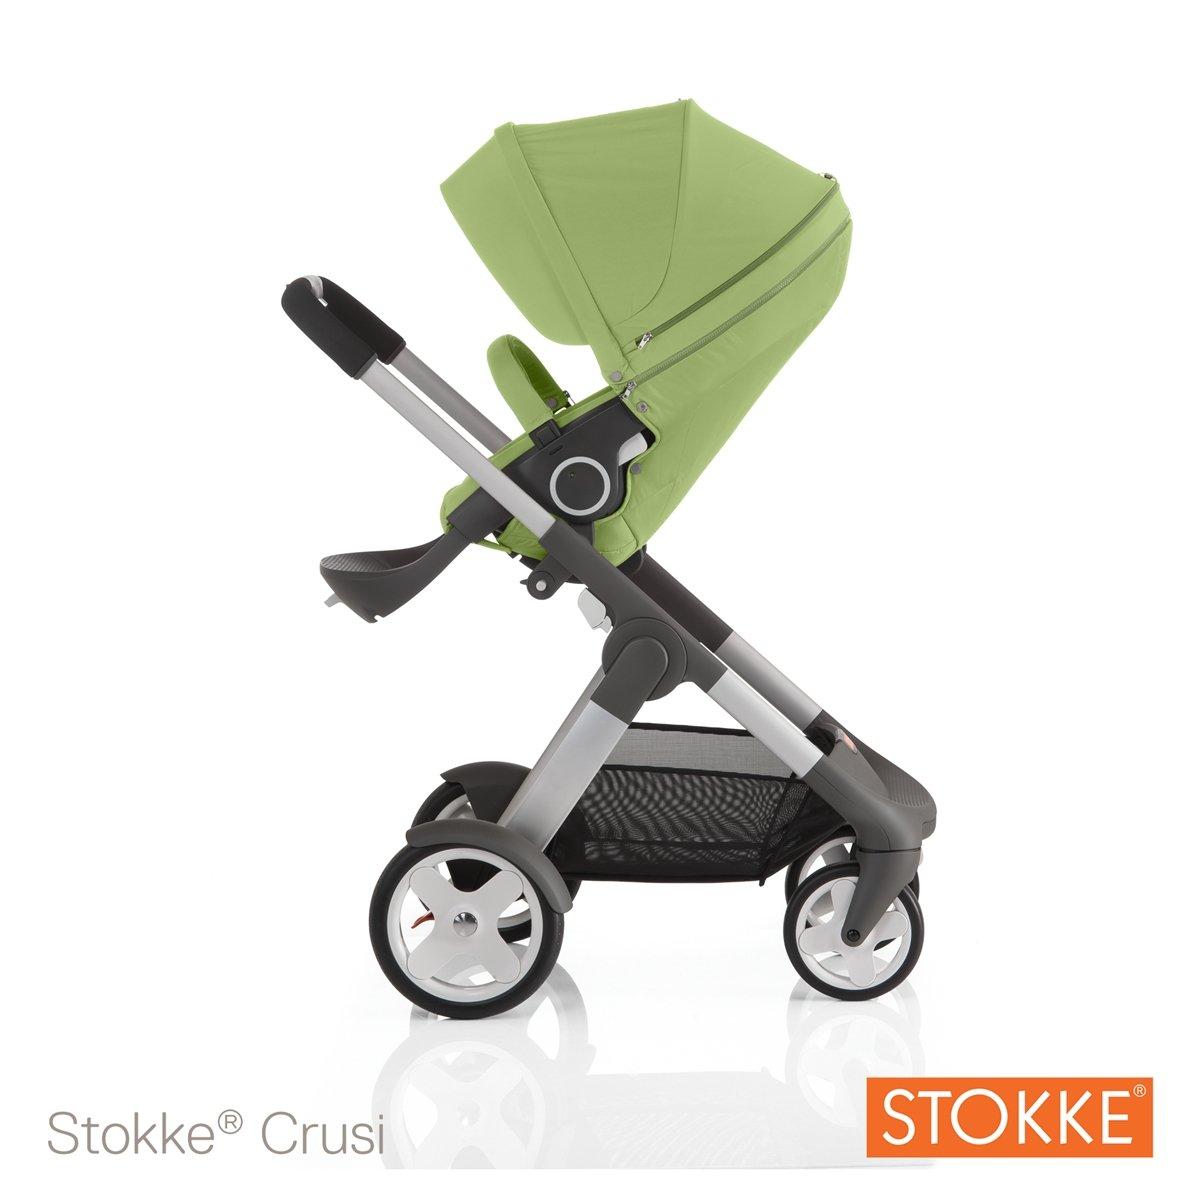 Amazon.com: Stokke Crusi Stroller – Luz Verde – Talla única ...